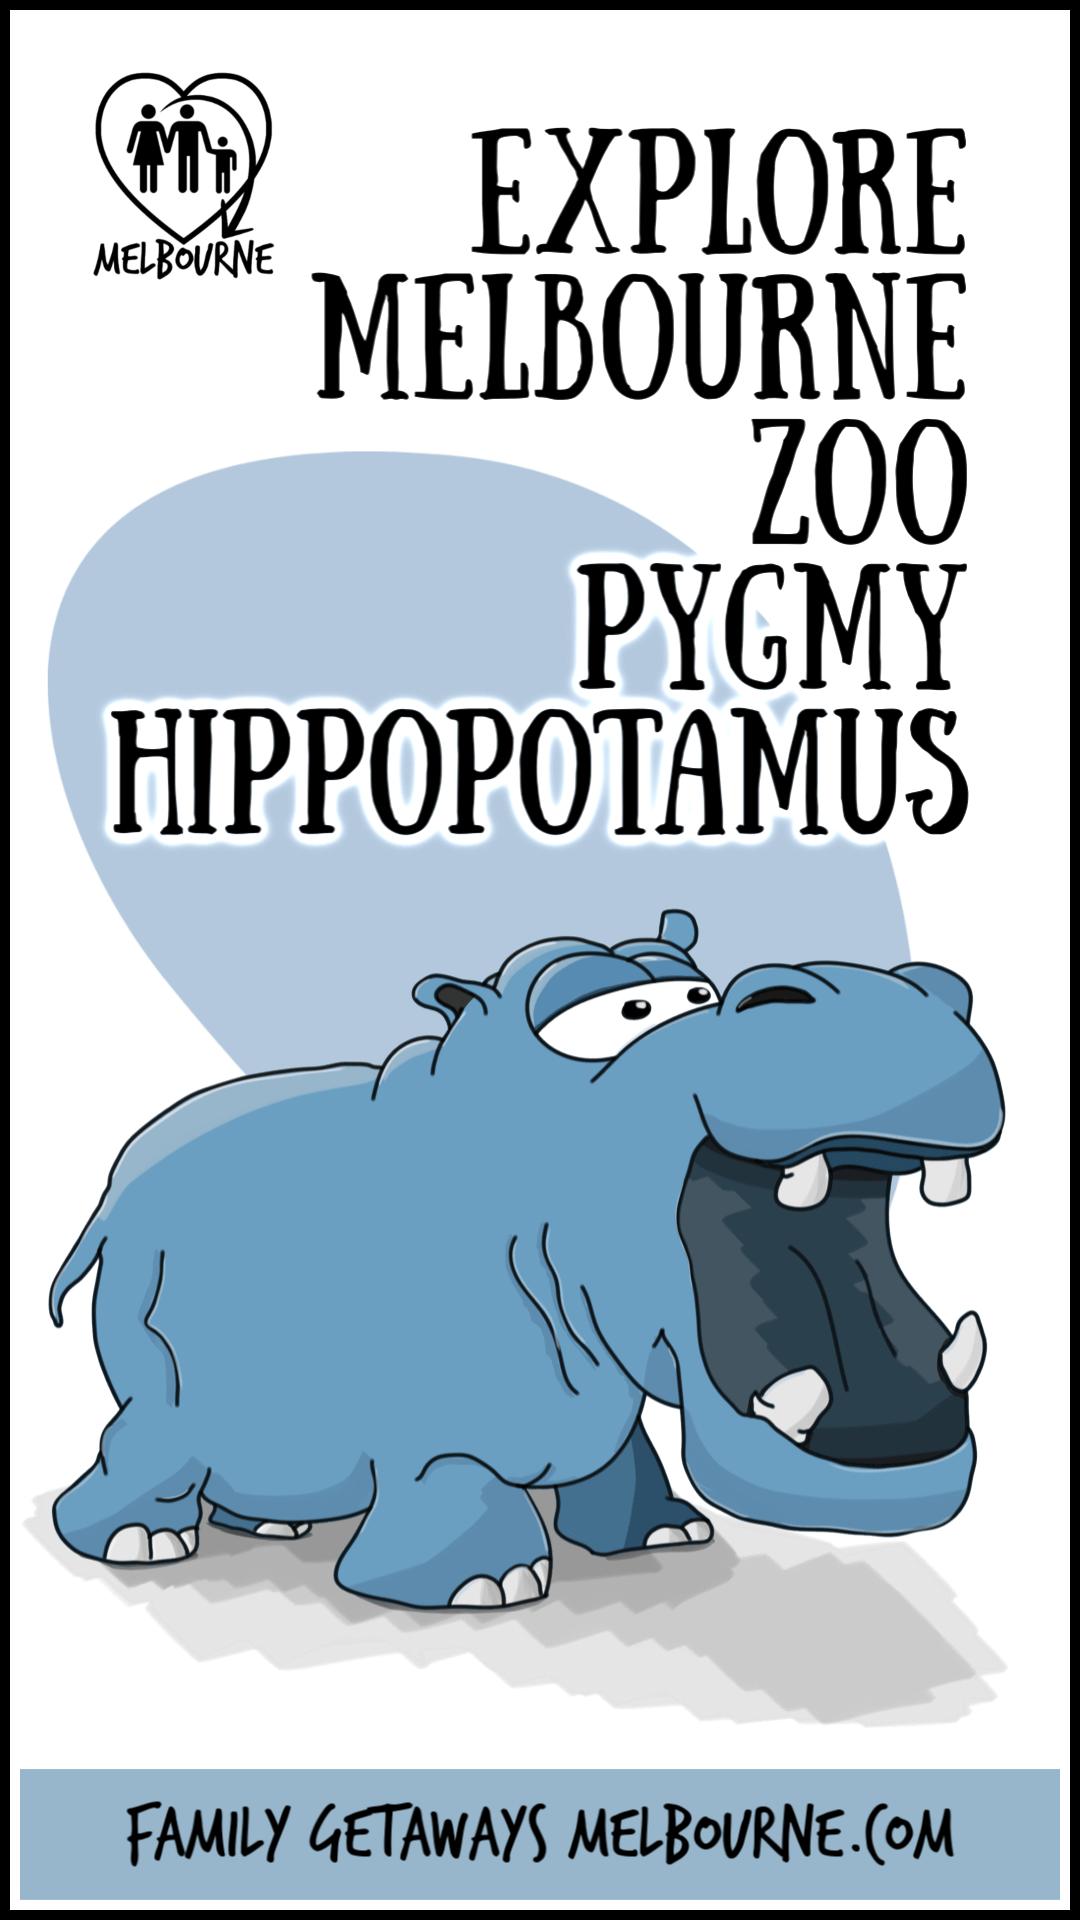 Pin this image to Pinterest of the Melbourne Zoo's pygmy hippopotamus